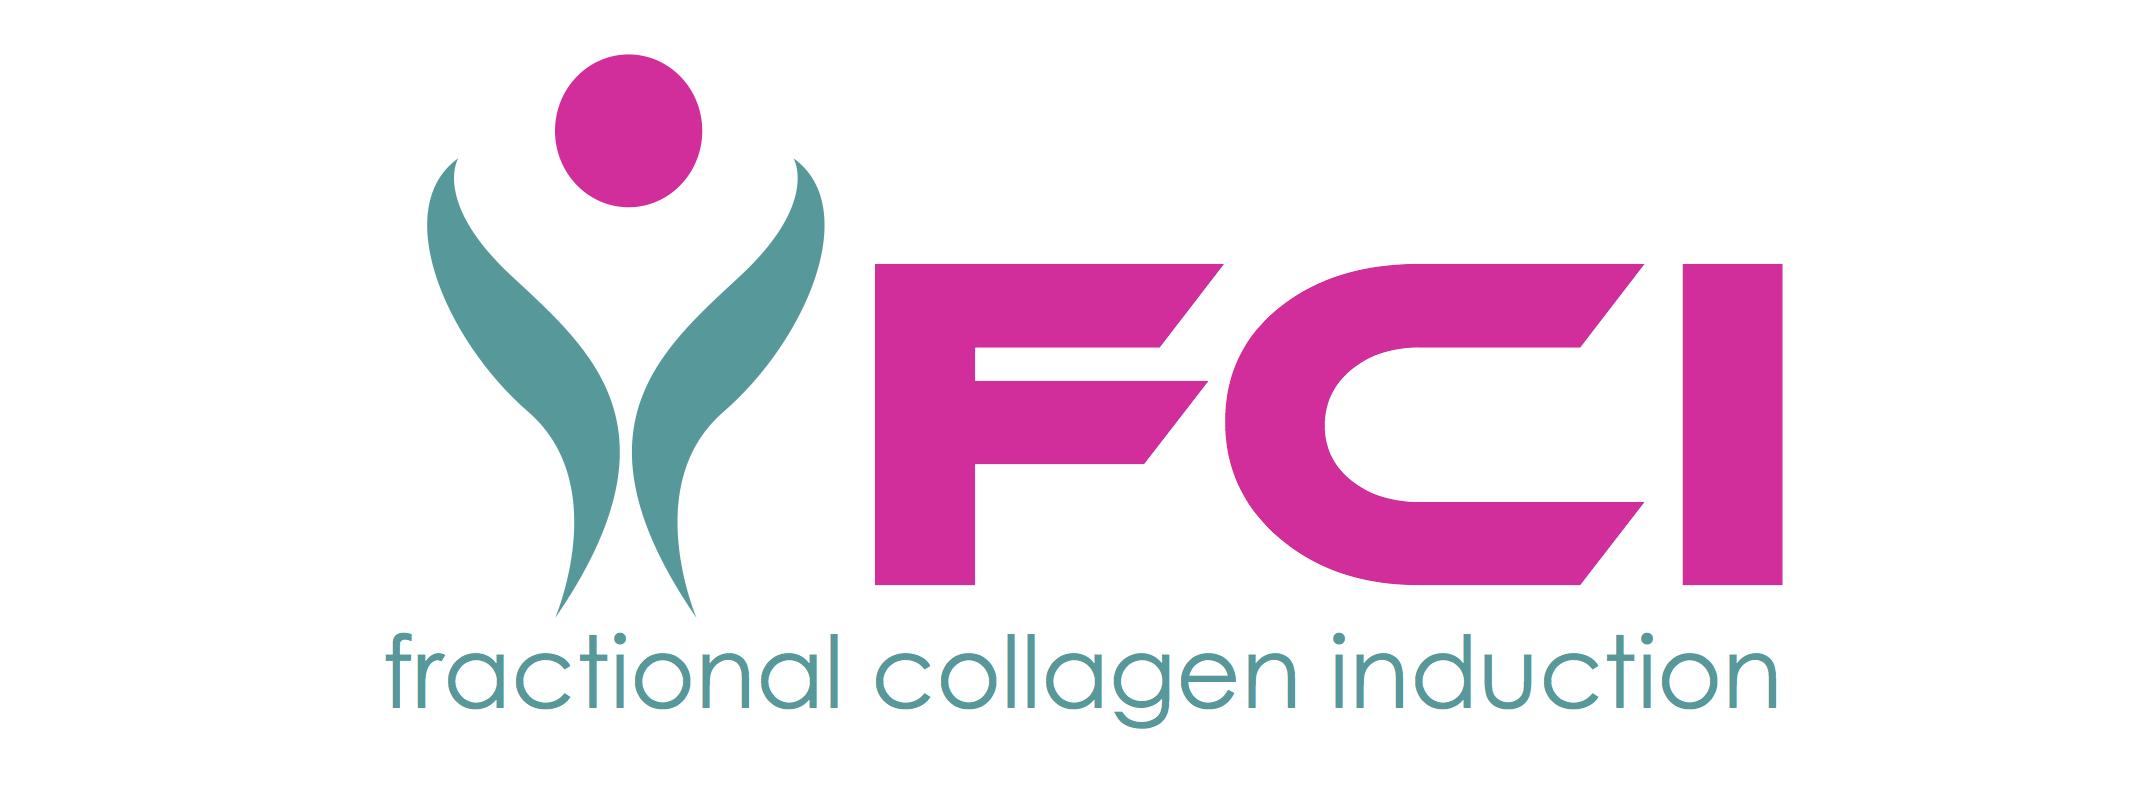 Fractional Collagen Induction Logo